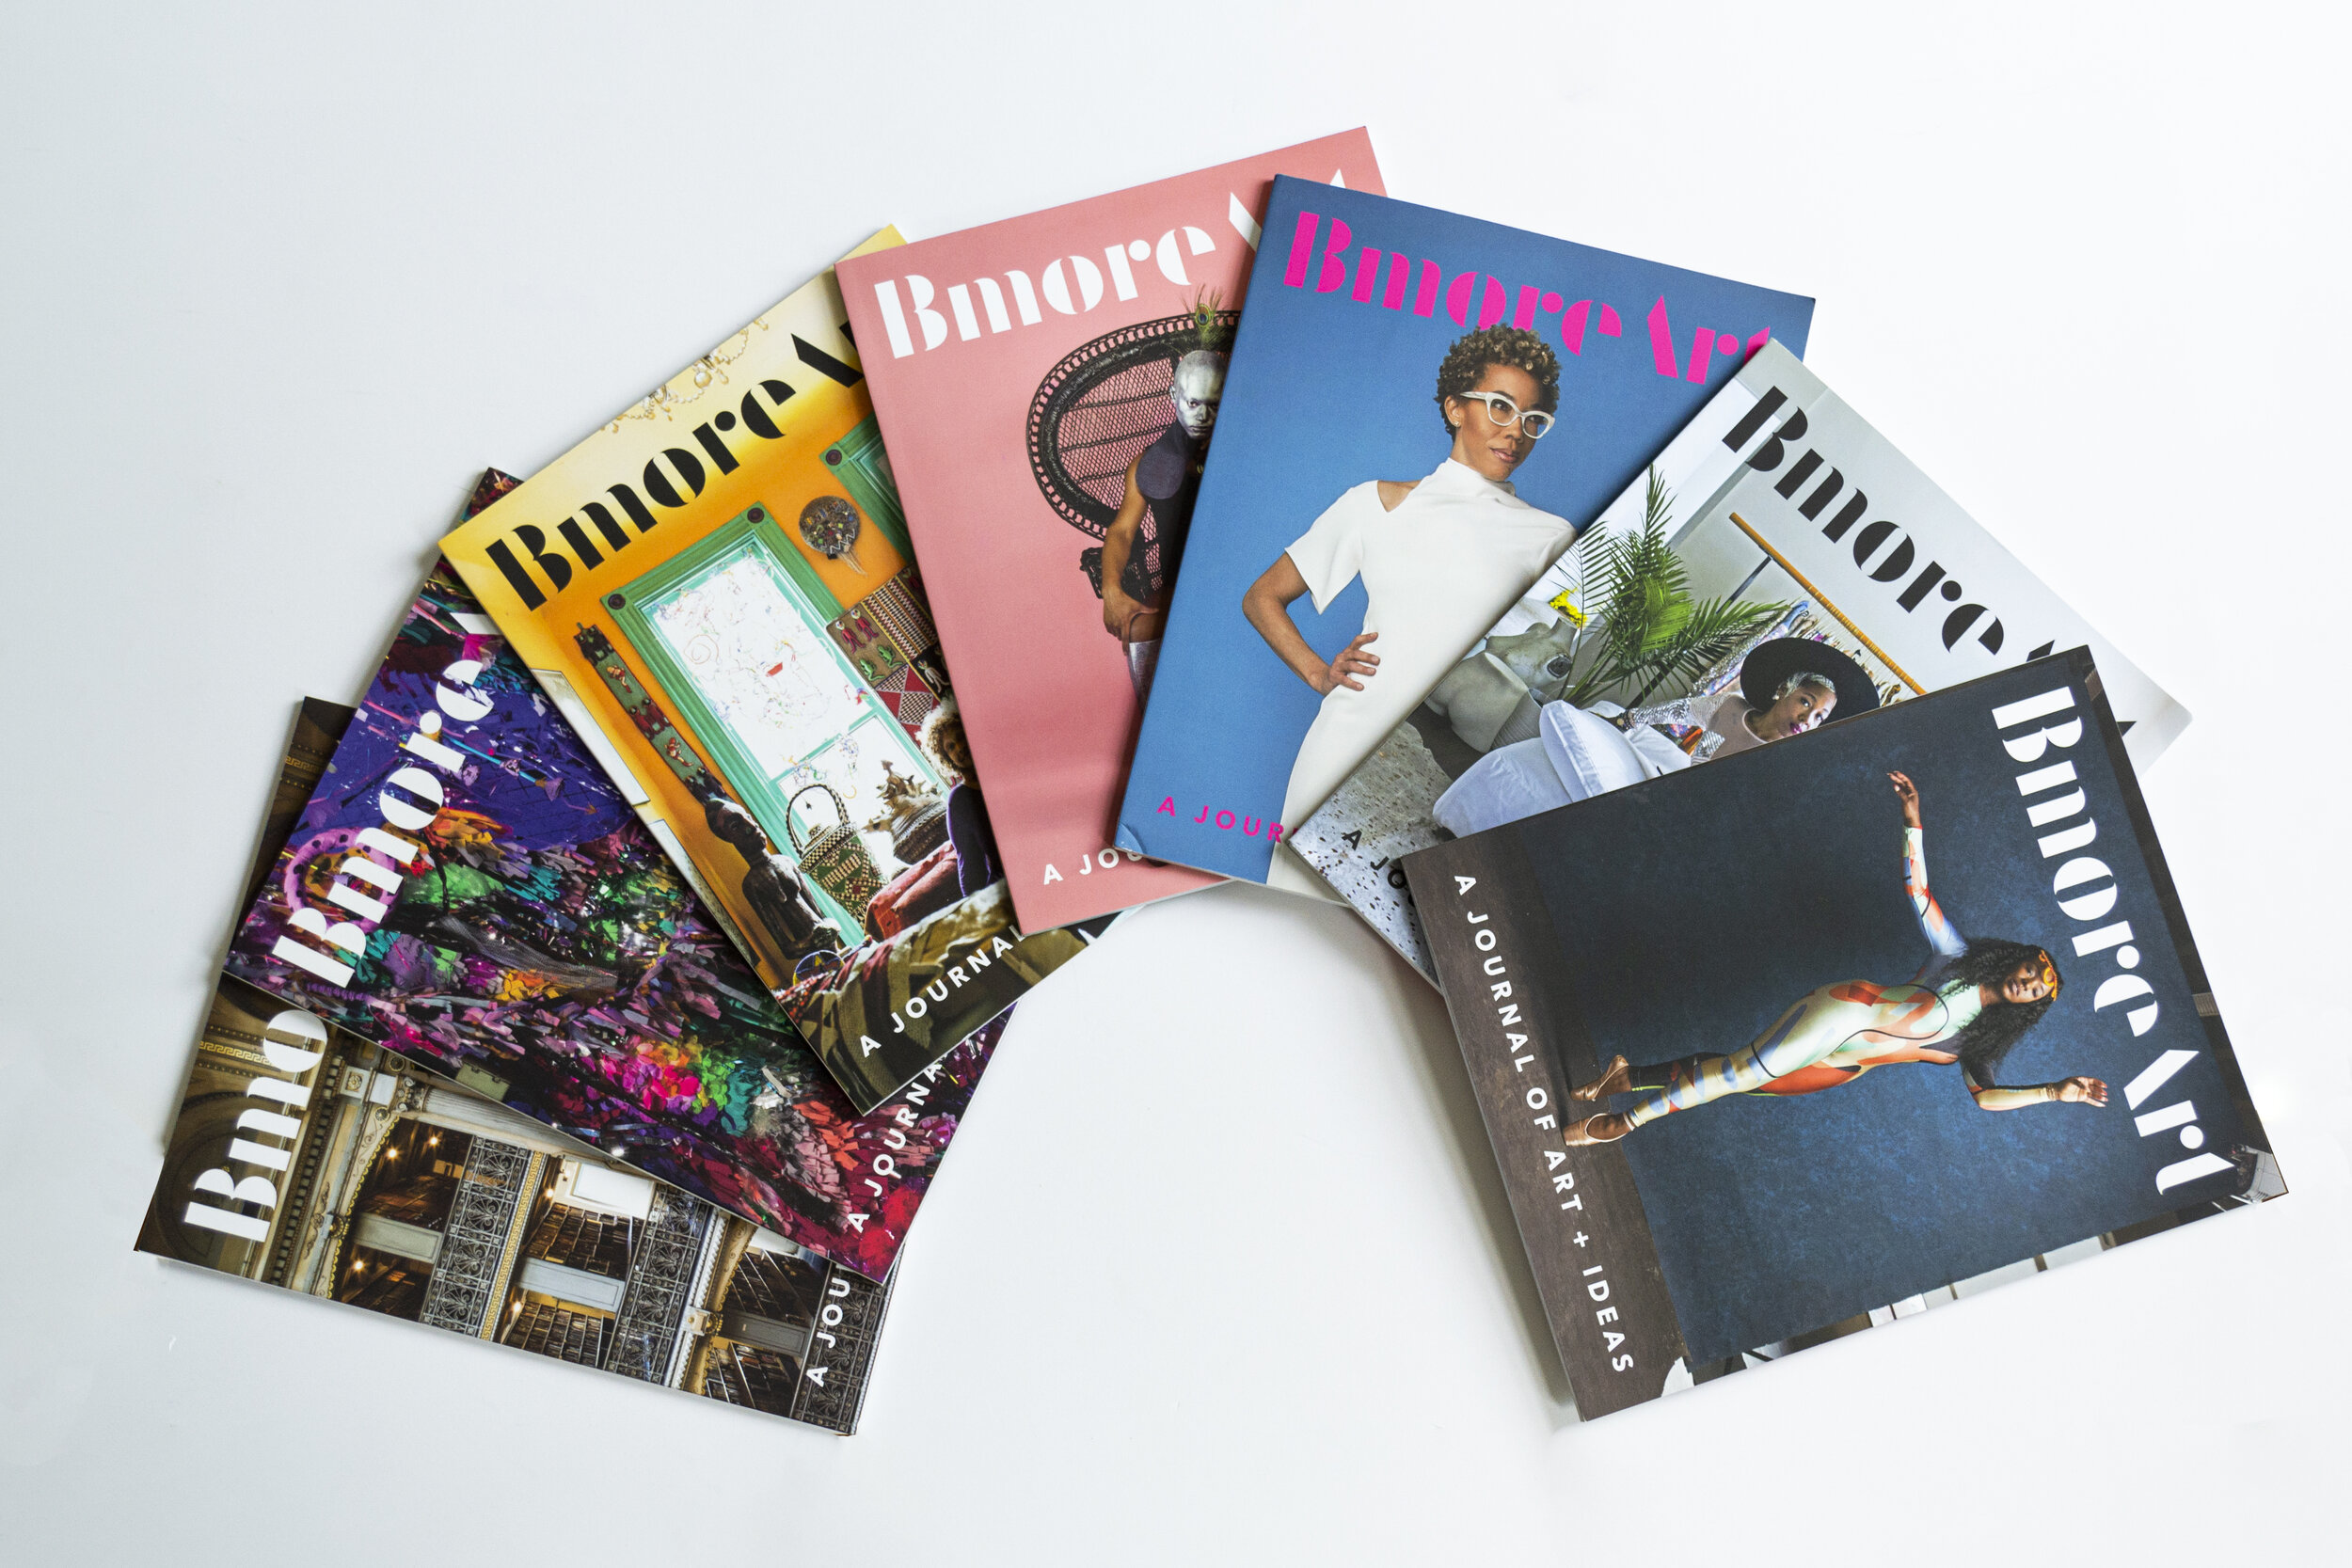 THE BMOREART JOURNAL OF ART + IDEAS, ISSUES 1-7